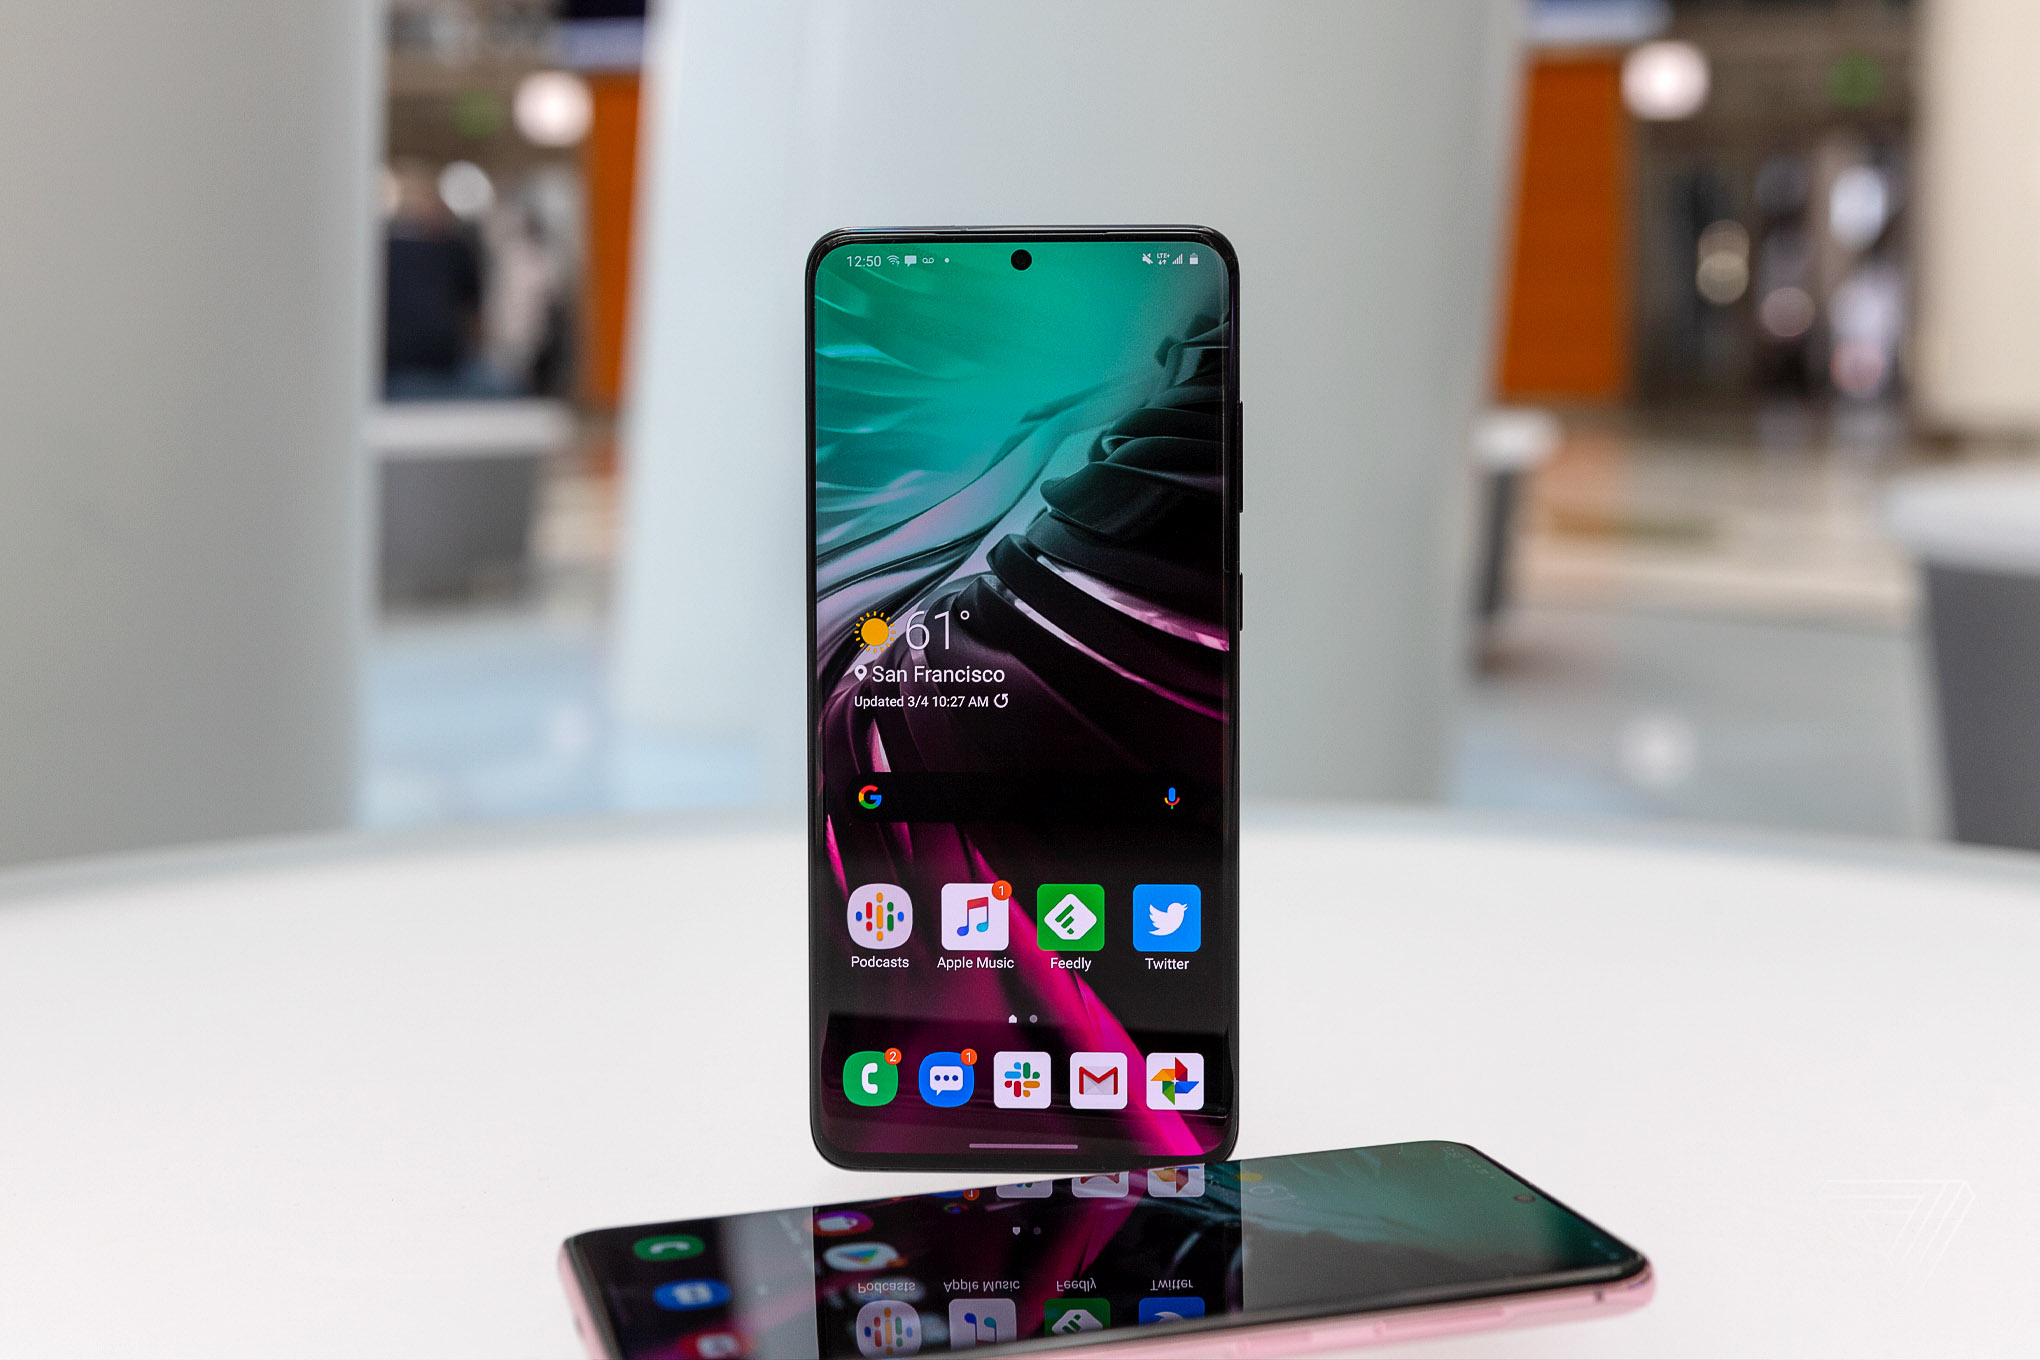 The Samsung Galaxy S20 Plus smartphone